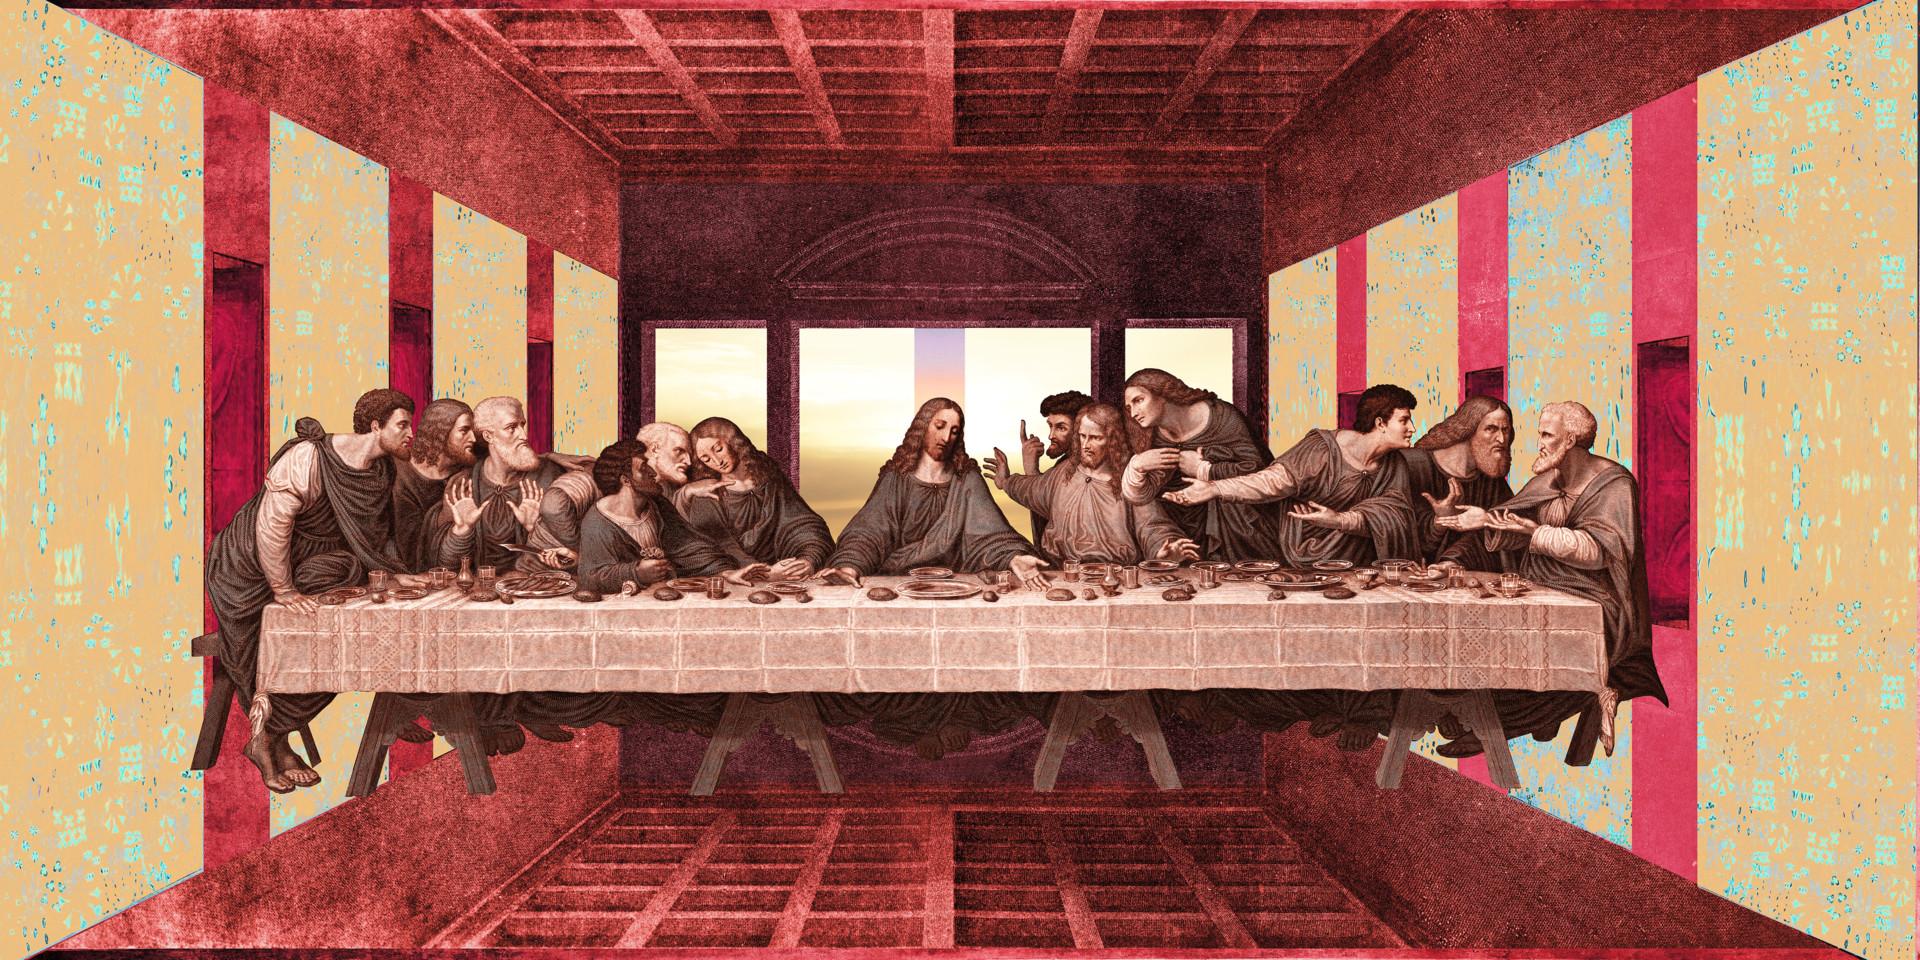 Michael Schwahn - 6-last-supper-engraving-6.jpg